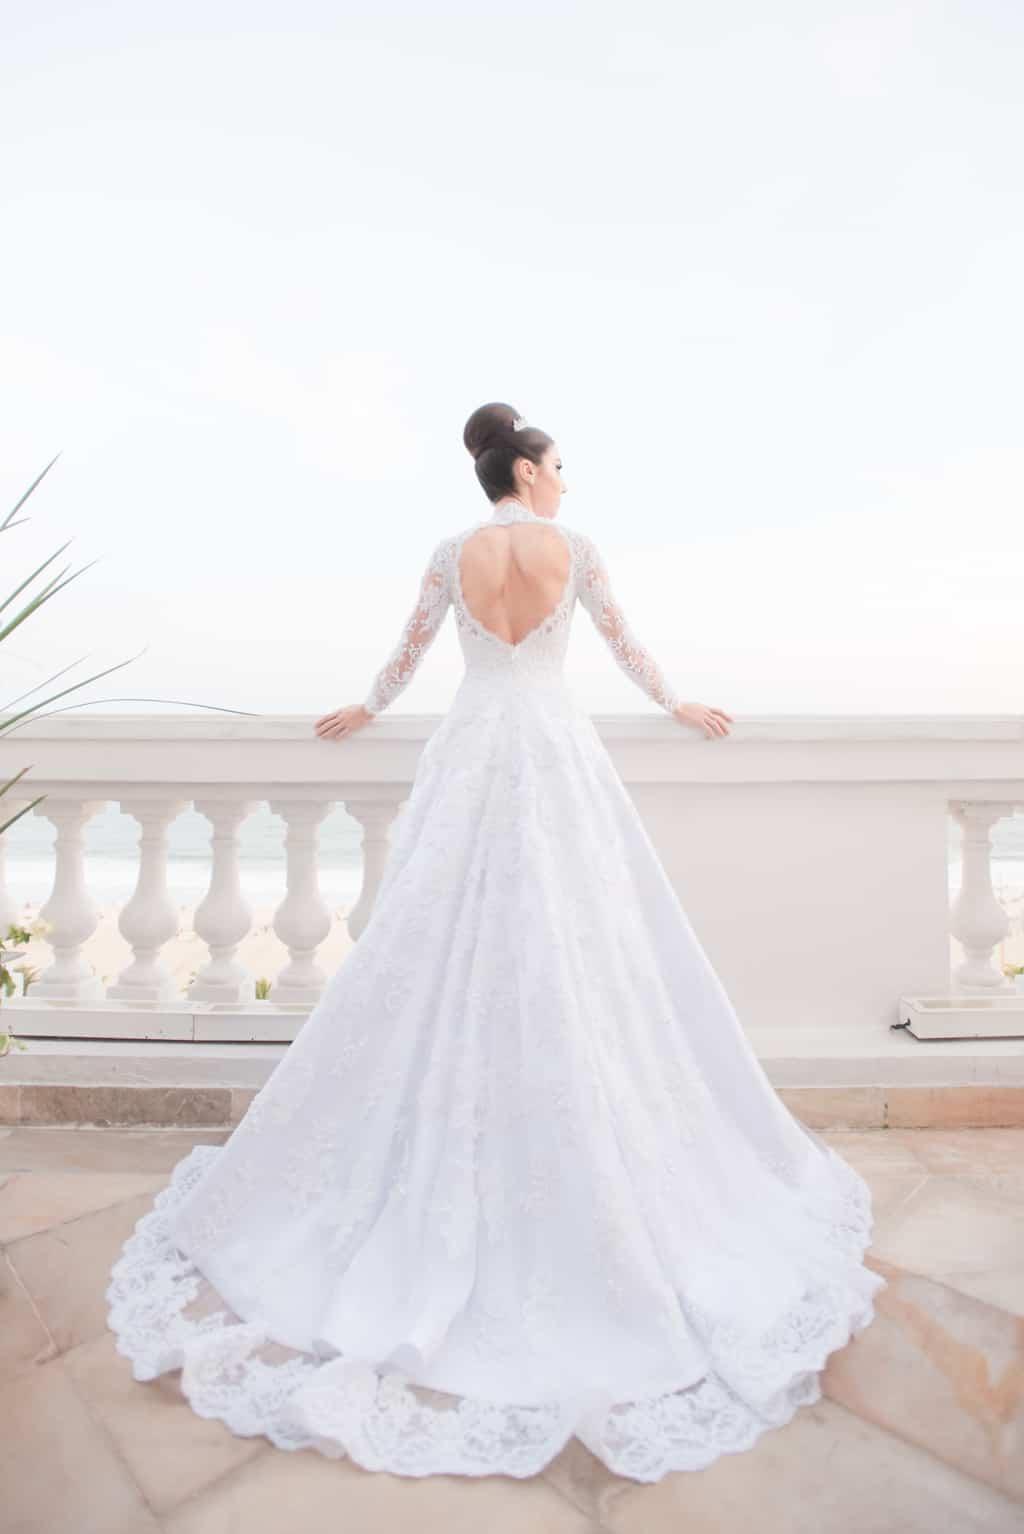 casamento-Patricia-e-Thiago-Copacabana-Palace-Marcelo-Hicho-Paula-Rocha-Marina-Fava-Making-Of0319-Patricia-e-Thiago-WAL_2850